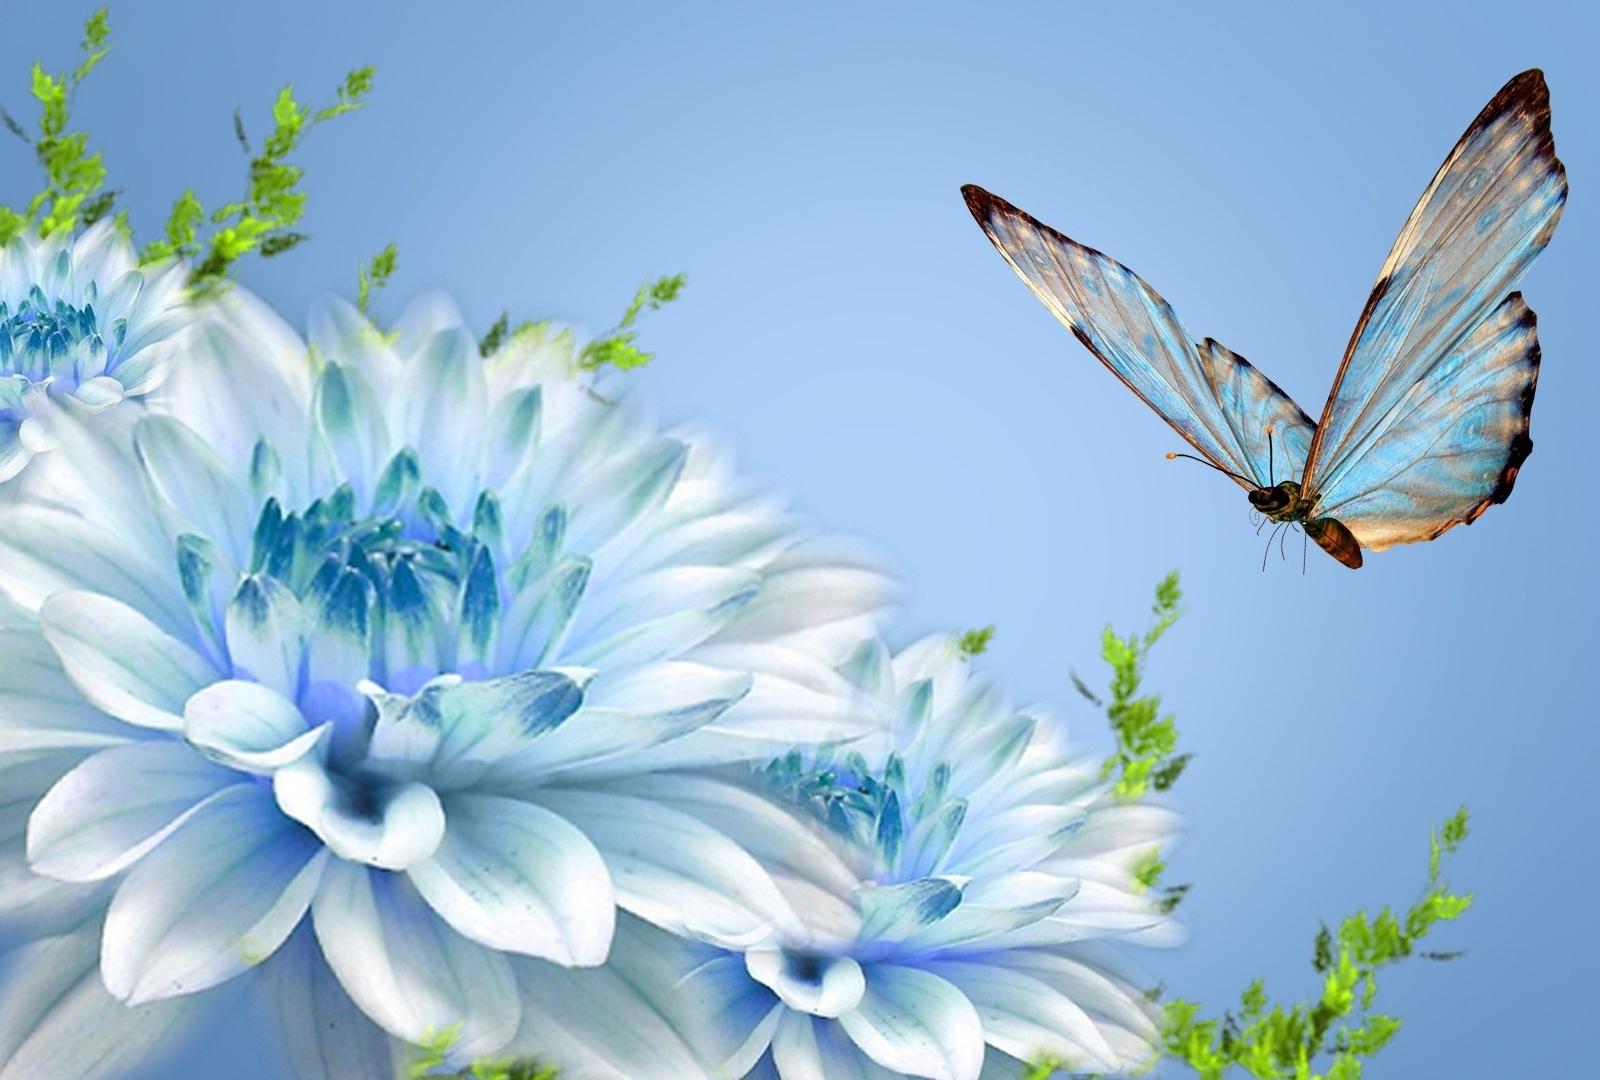 Butterfly Wallpapers Desktop Wallpapers 1600x1080